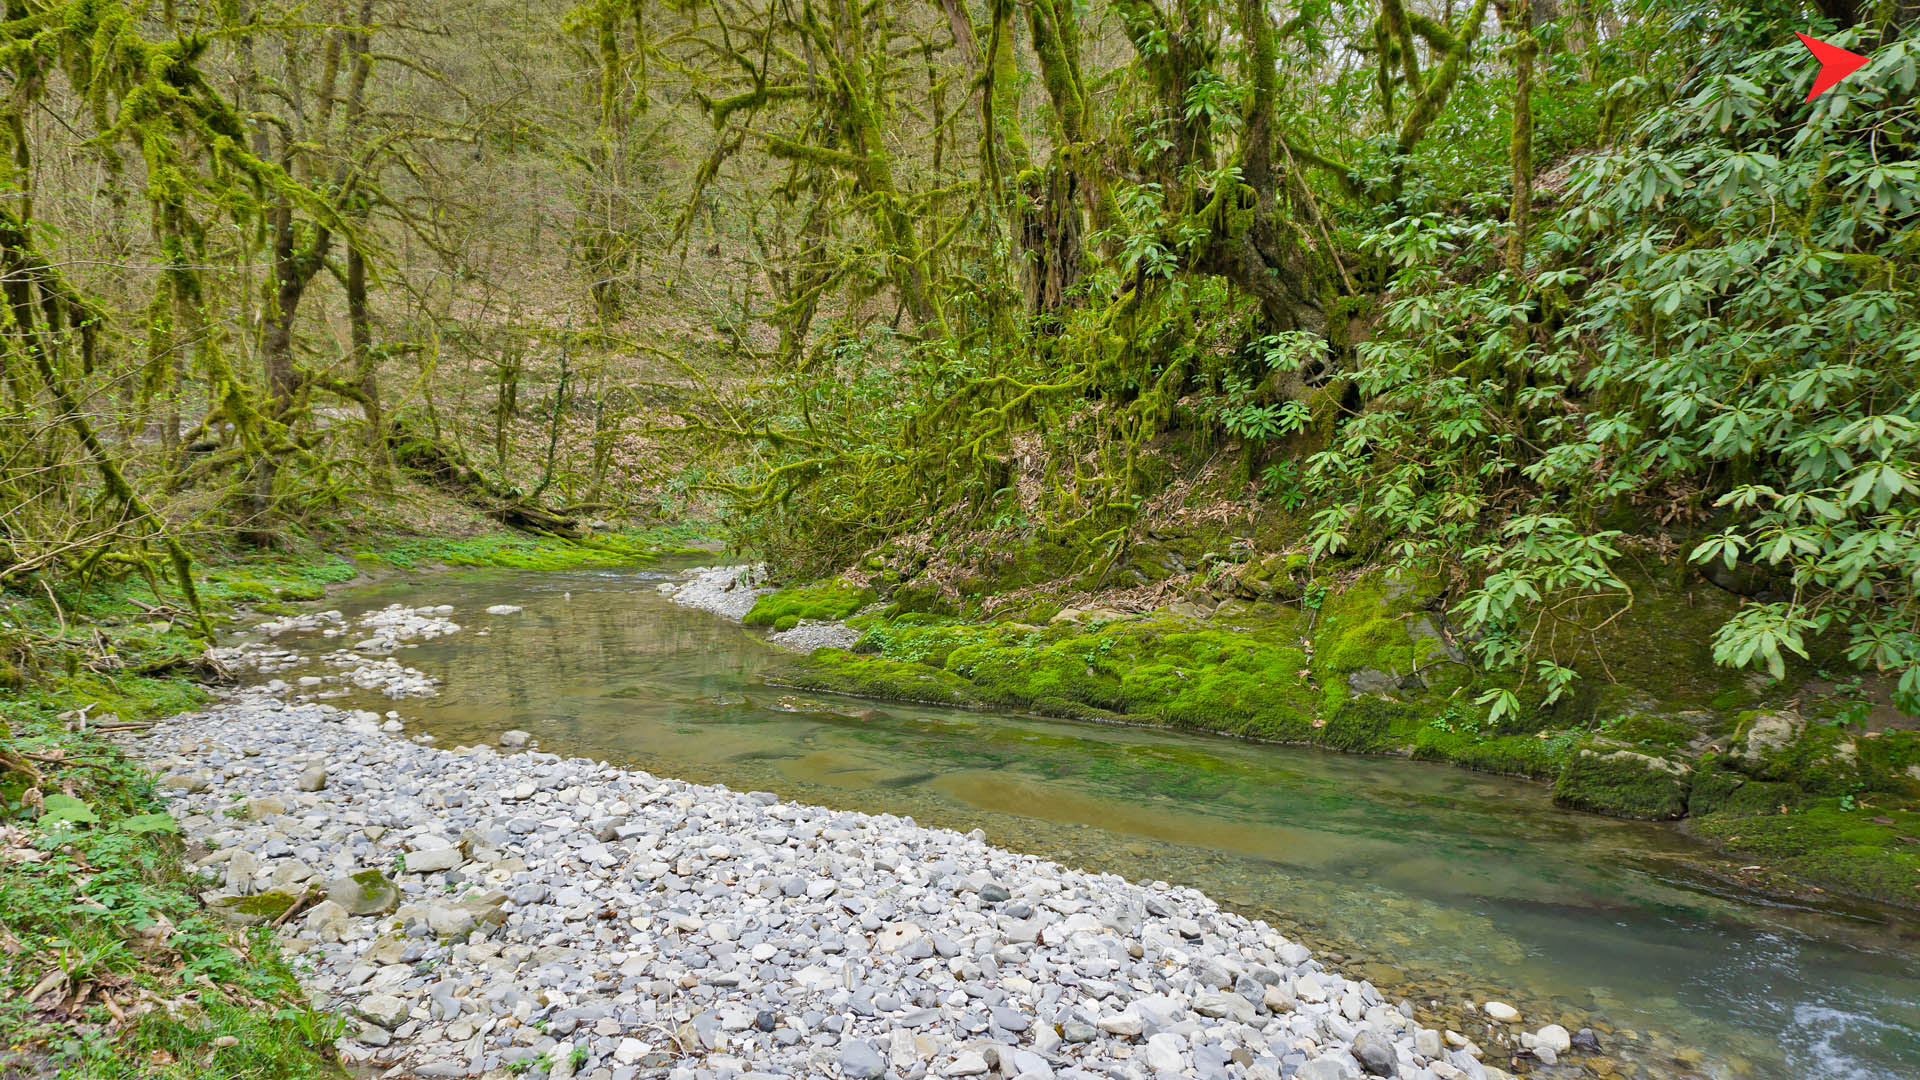 трети реки рядом с лоо фото картинка